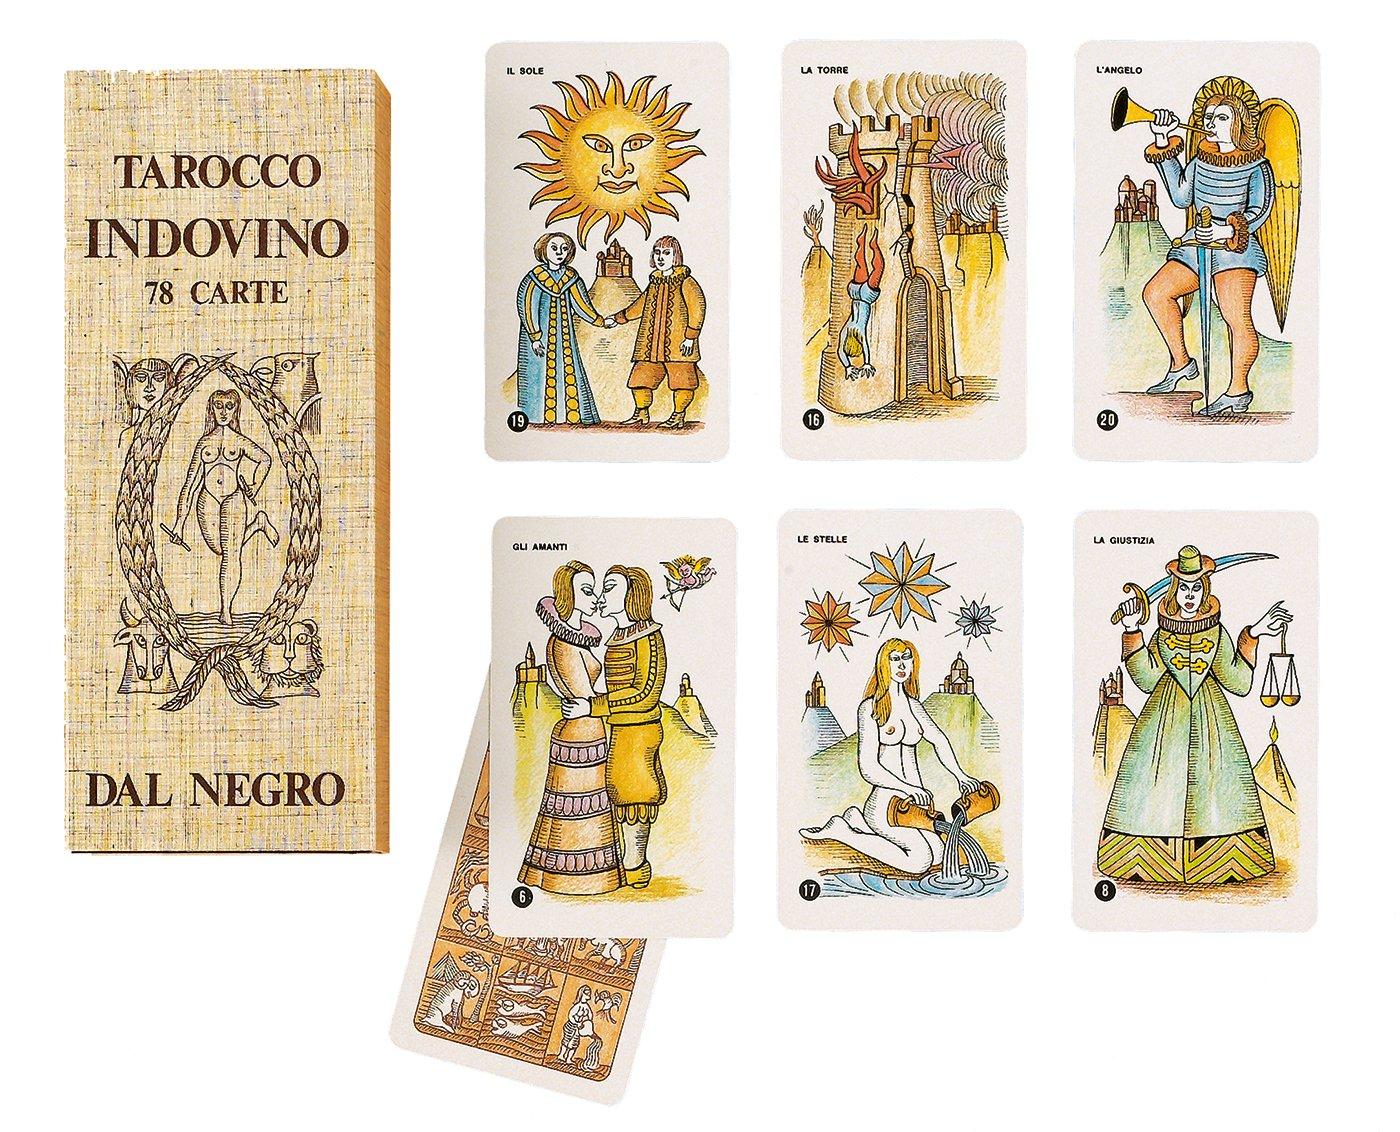 Tarocco Indovino by Dal Negro